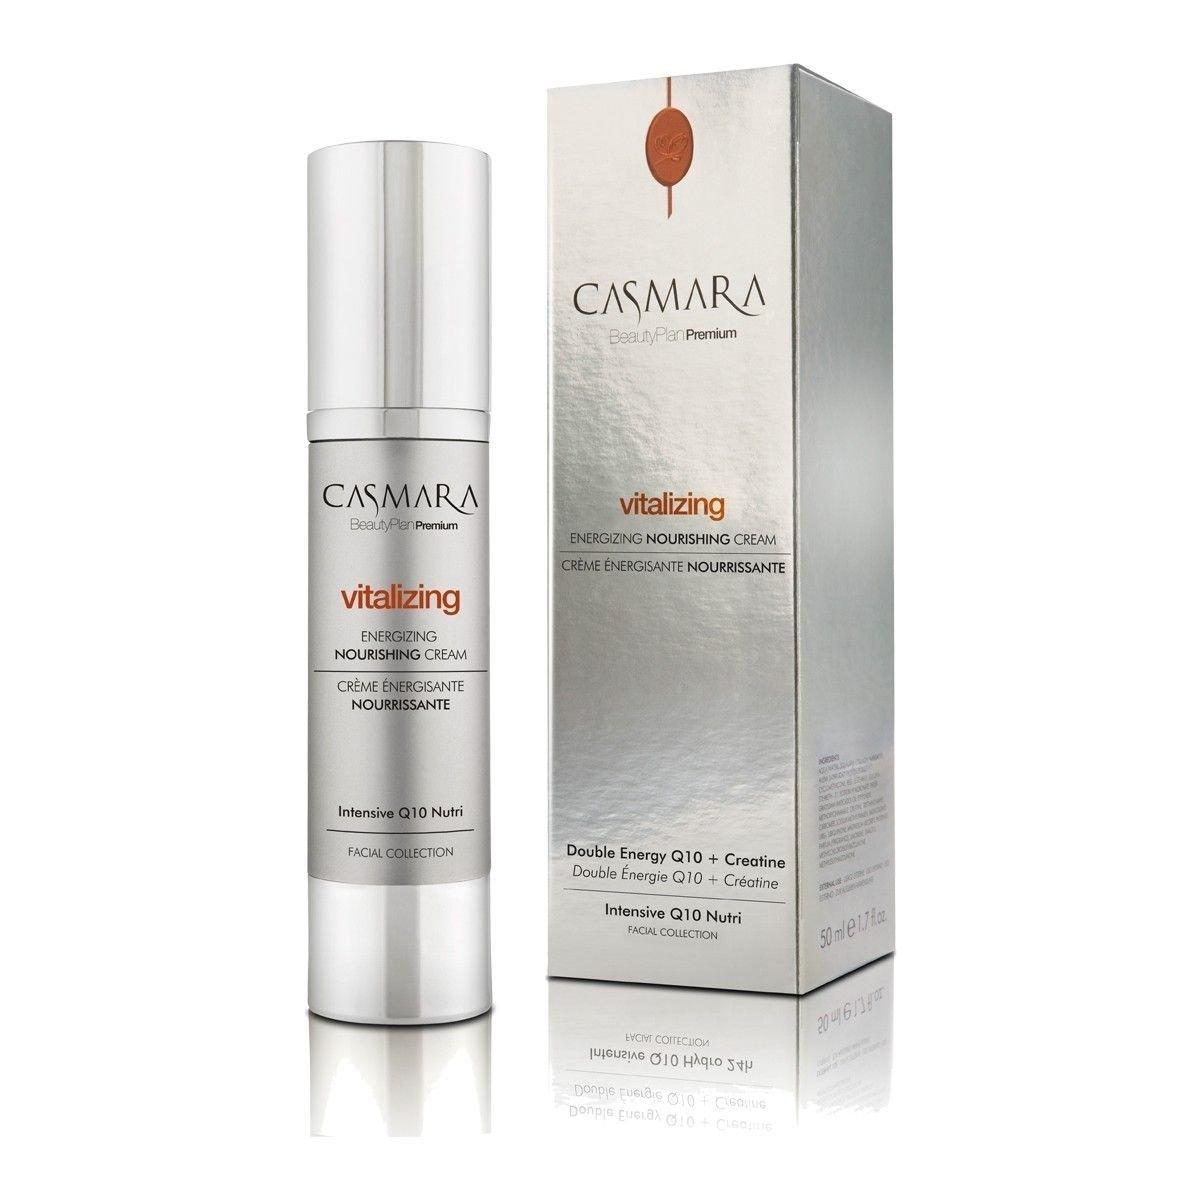 Afbeelding van Casmara Energizing Nourishing Cream 50Ml Vitalizing /